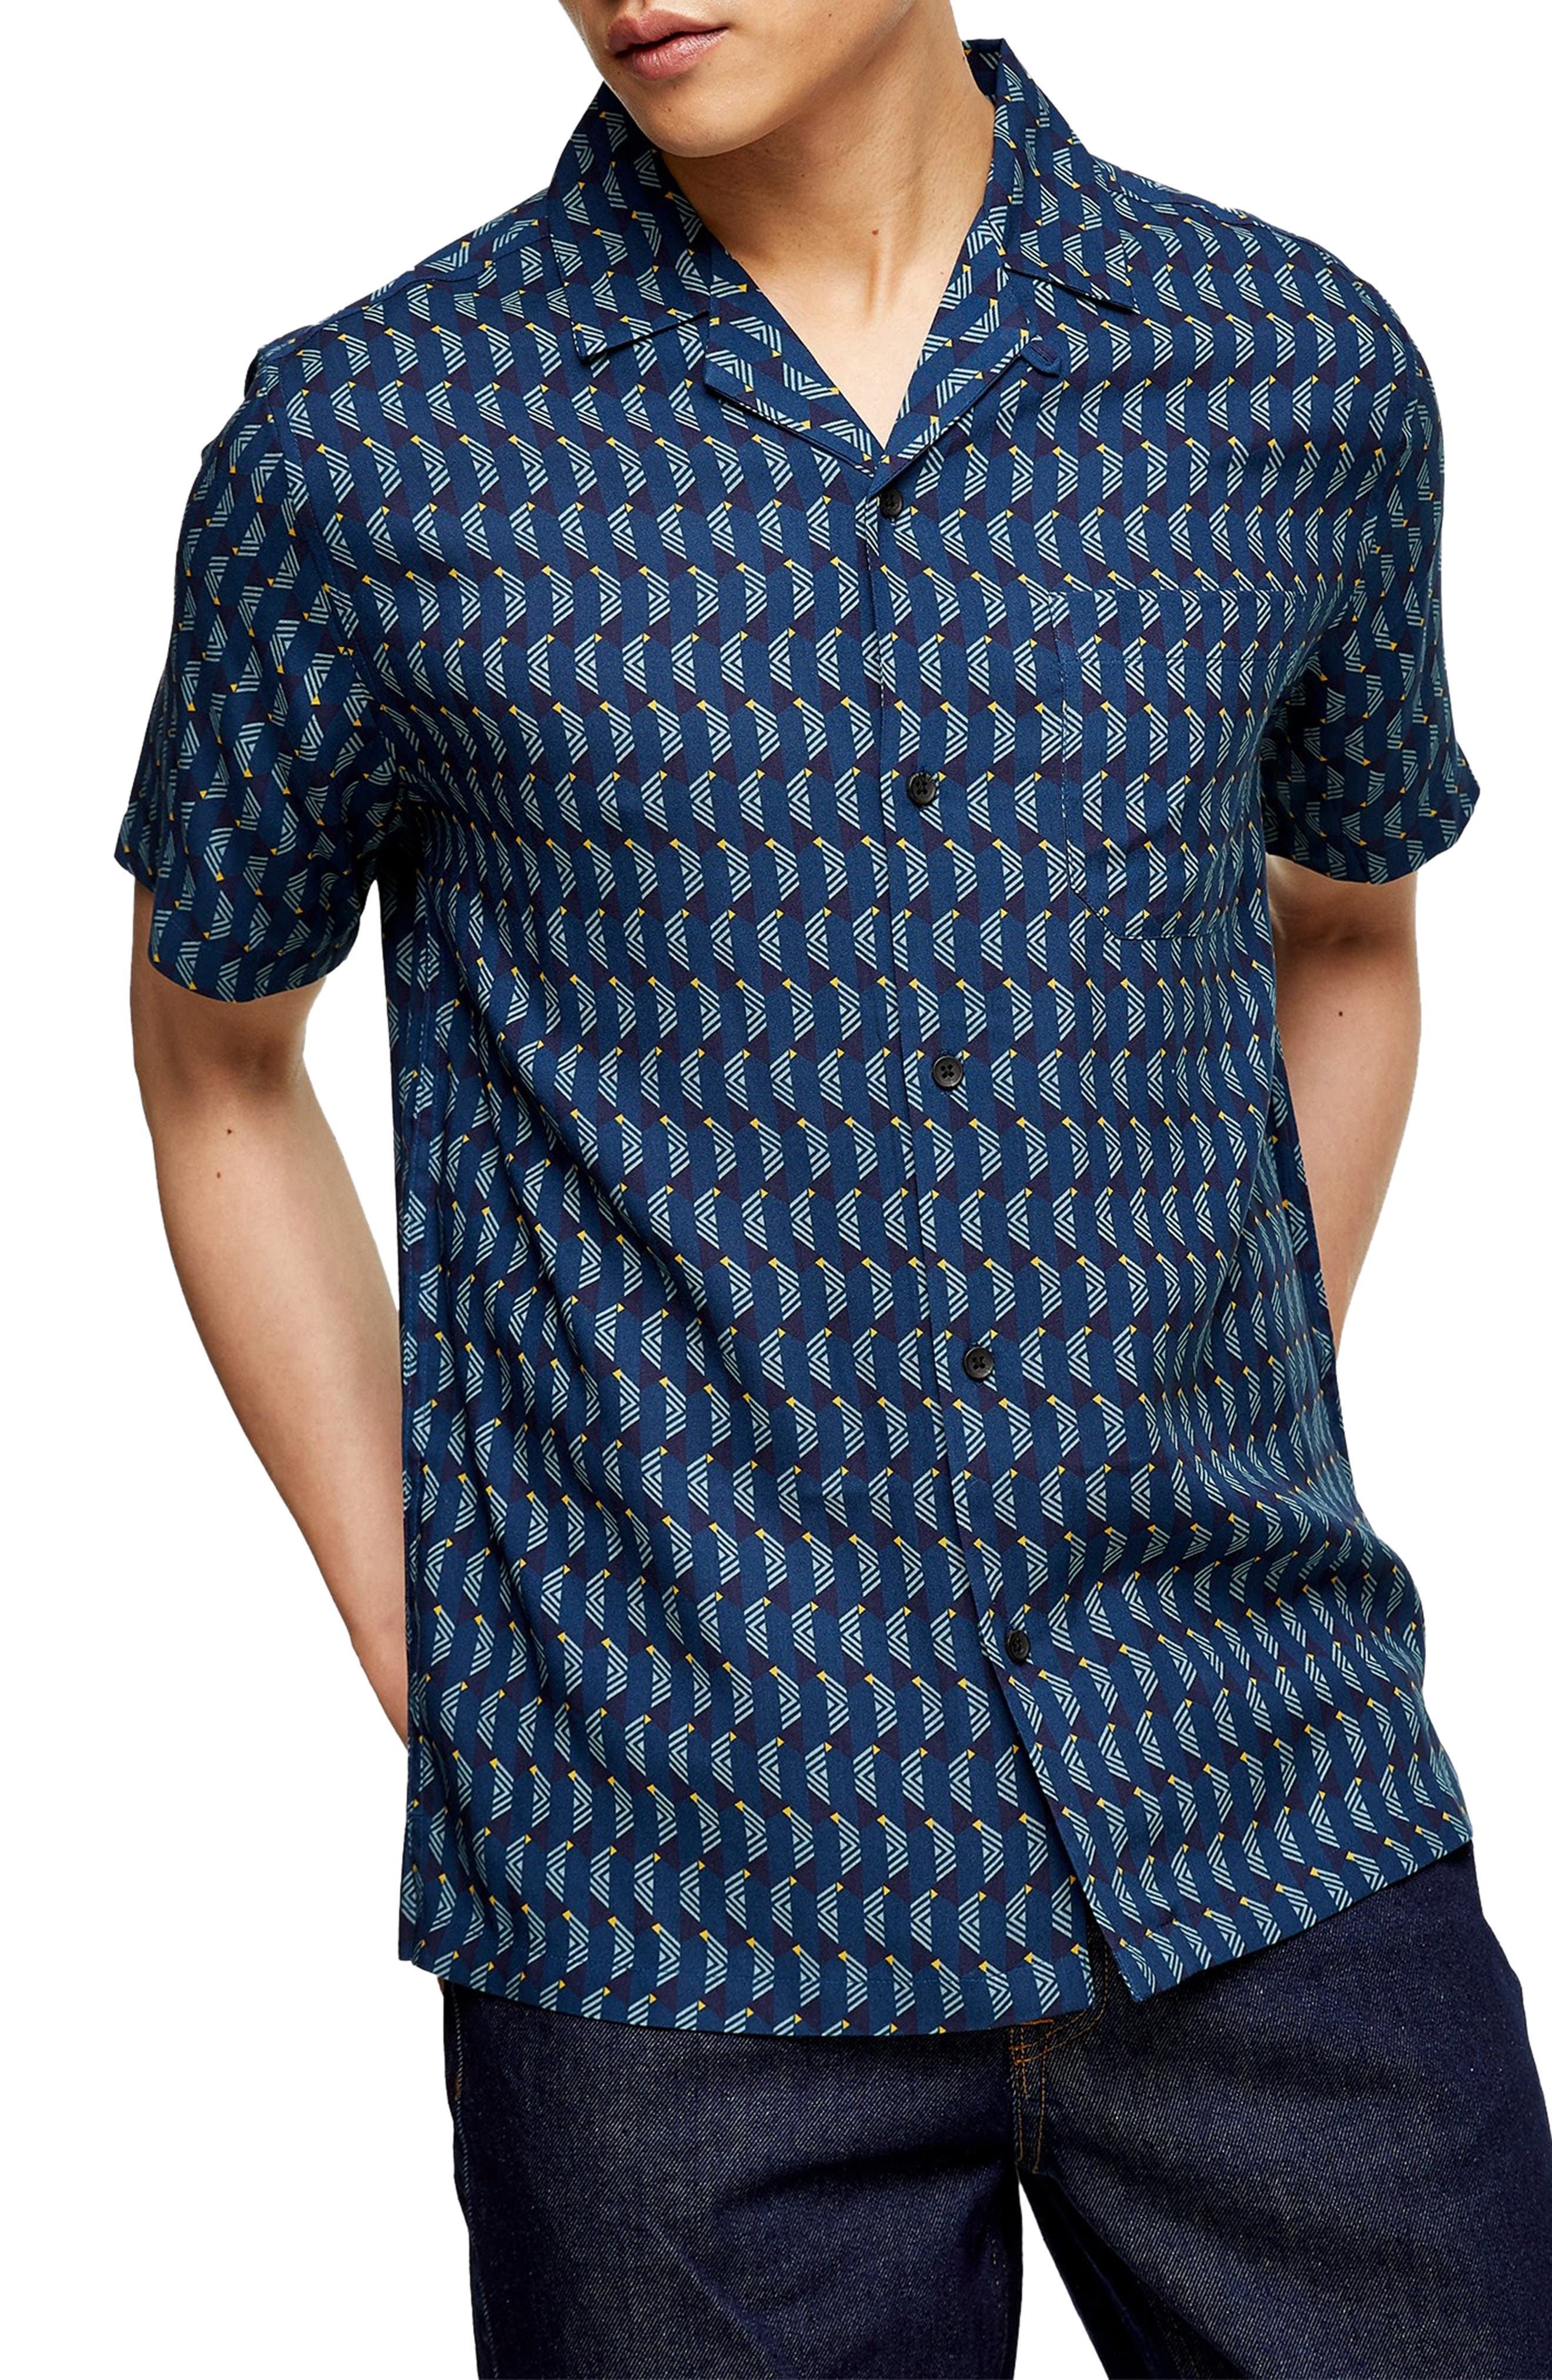 1960s Mens Shirts | 60s Mod Shirts, Hippie Shirts Mens Topman Slim Fit Geometric Print Camp Shirt Size X-Small - Blue $45.00 AT vintagedancer.com